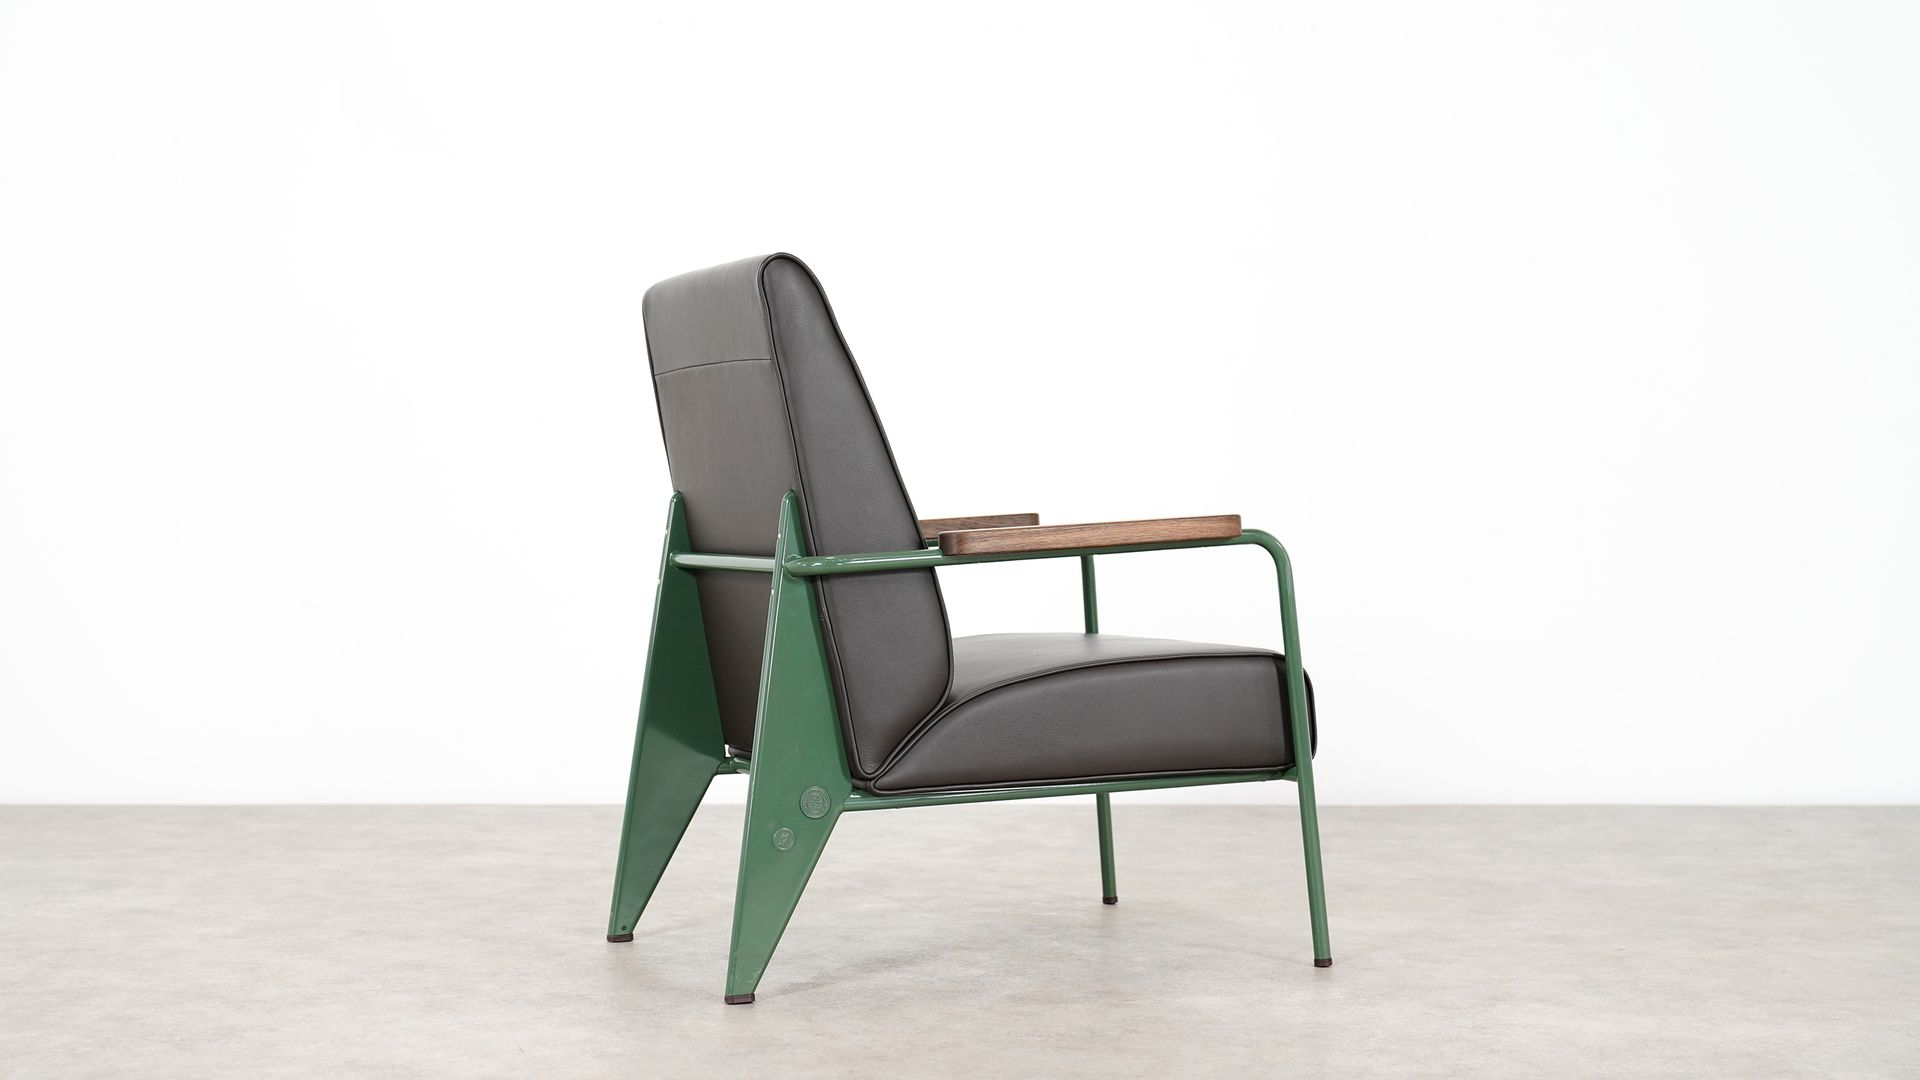 fauteuil de salon chair by jean prouv for vitra 1970s. Black Bedroom Furniture Sets. Home Design Ideas